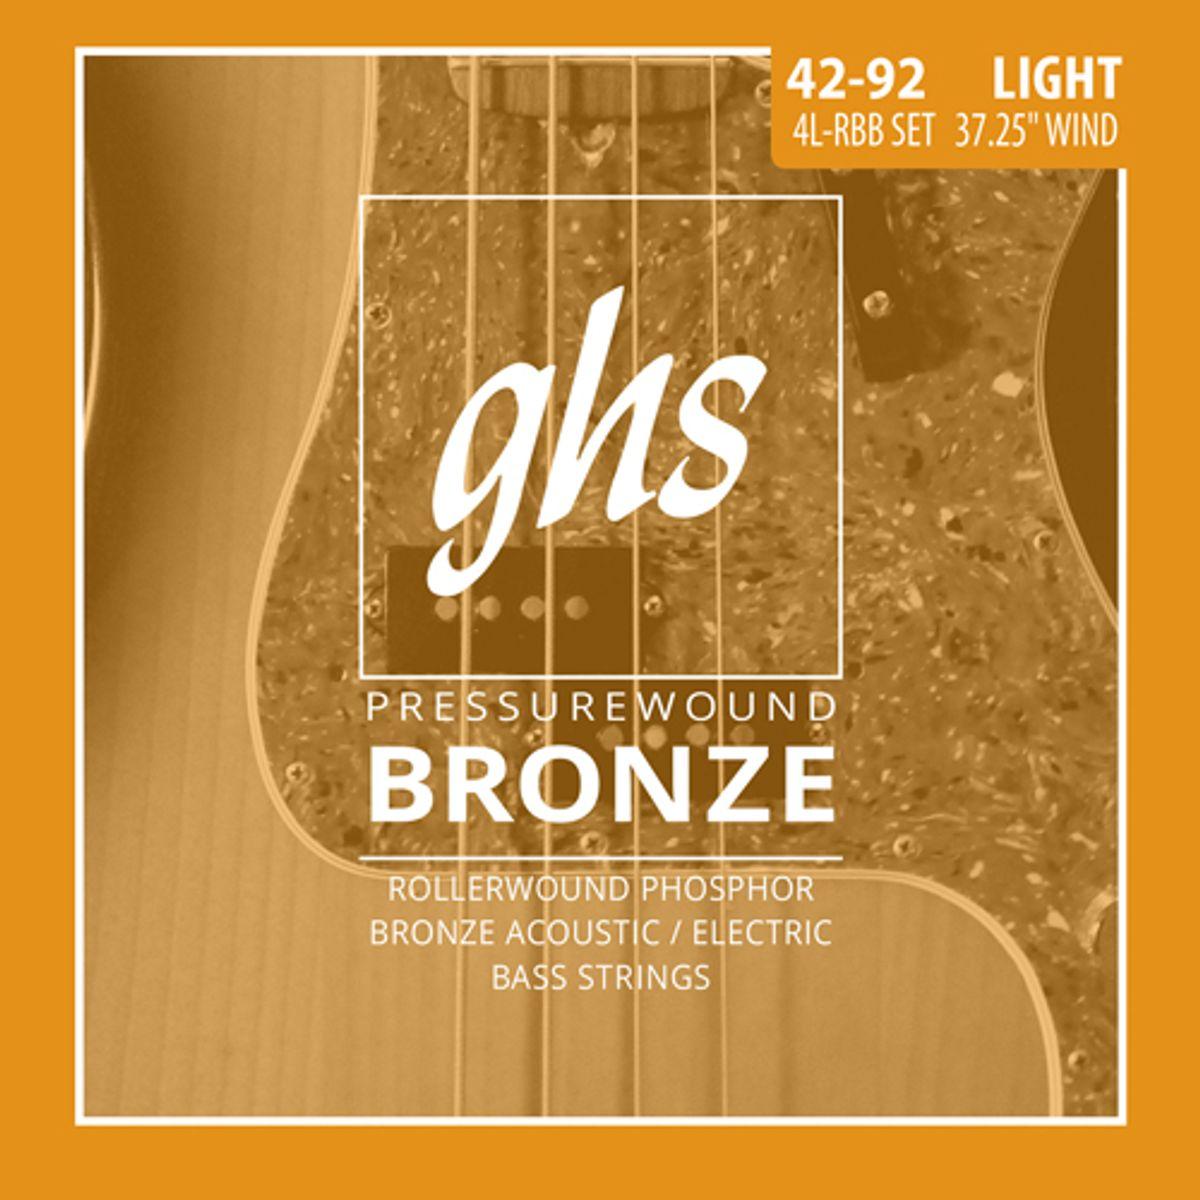 GHS Introduces Pressurewound Bronze Bass Strings